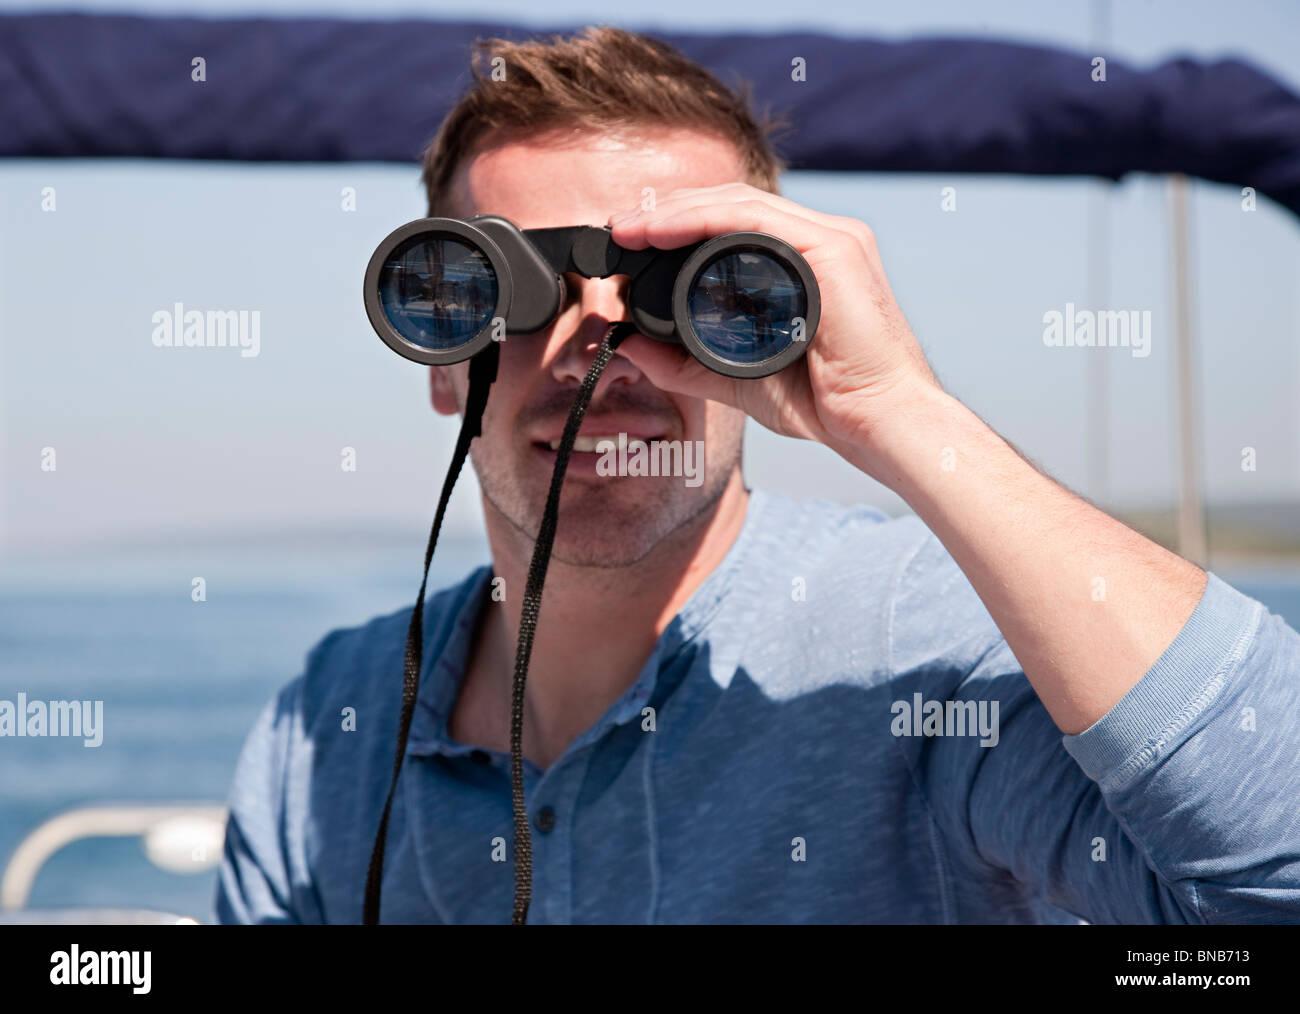 Man with binoculars on yacht - Stock Image